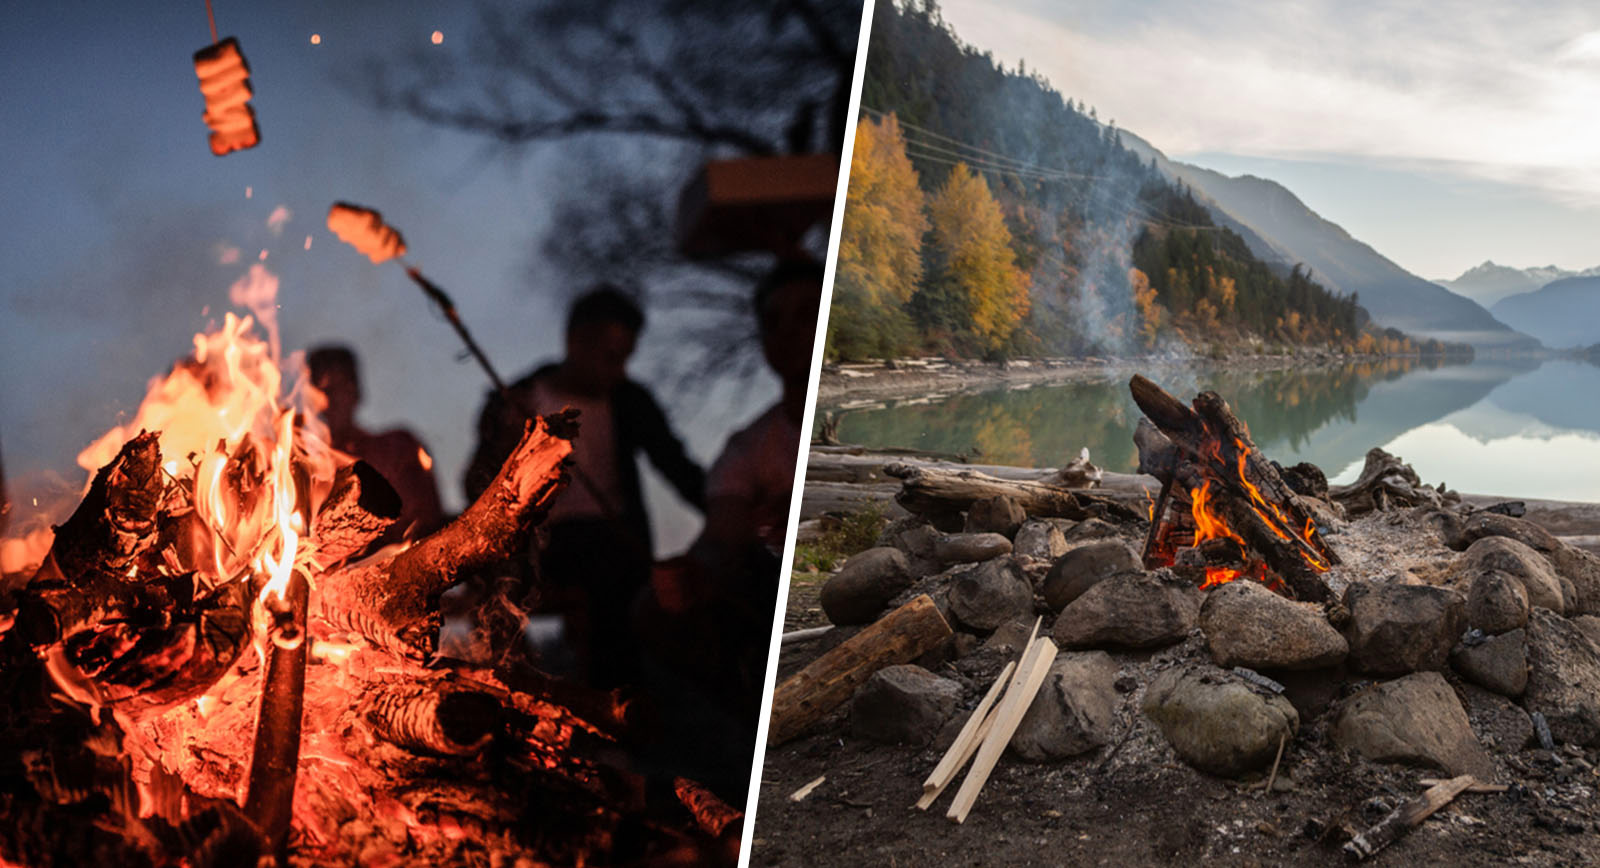 pelican consumer blog start a bonfire safely